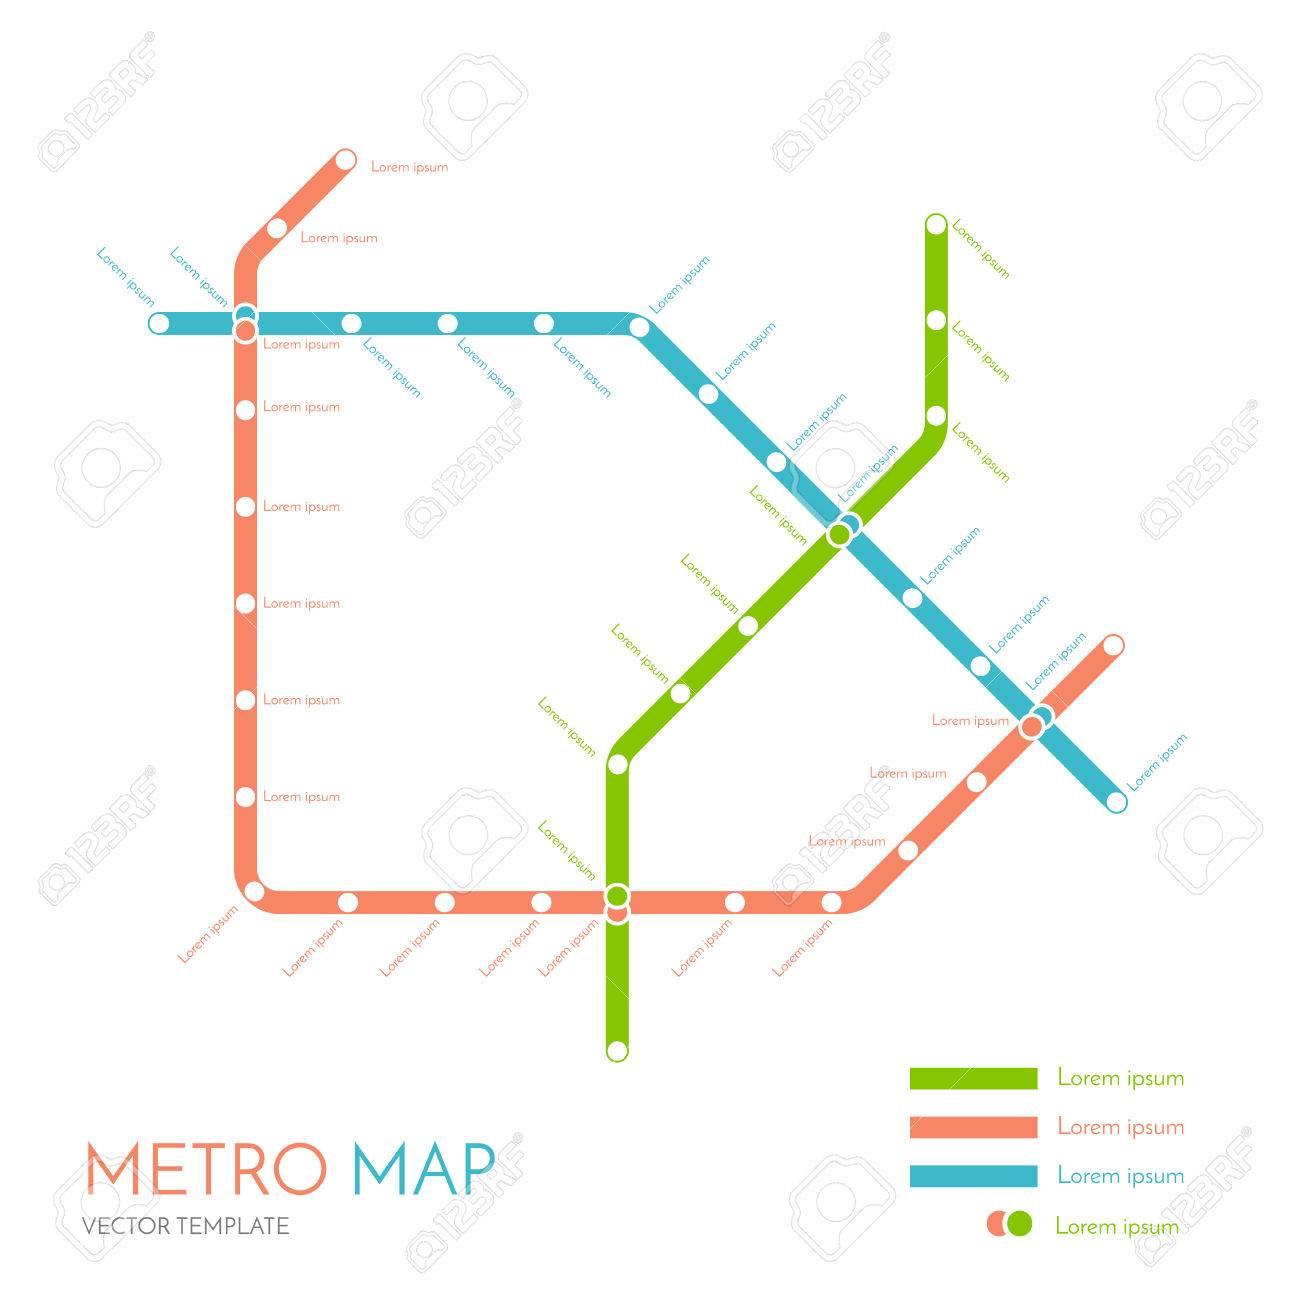 Metro Or Subway Map Design Template City Transportation Scheme